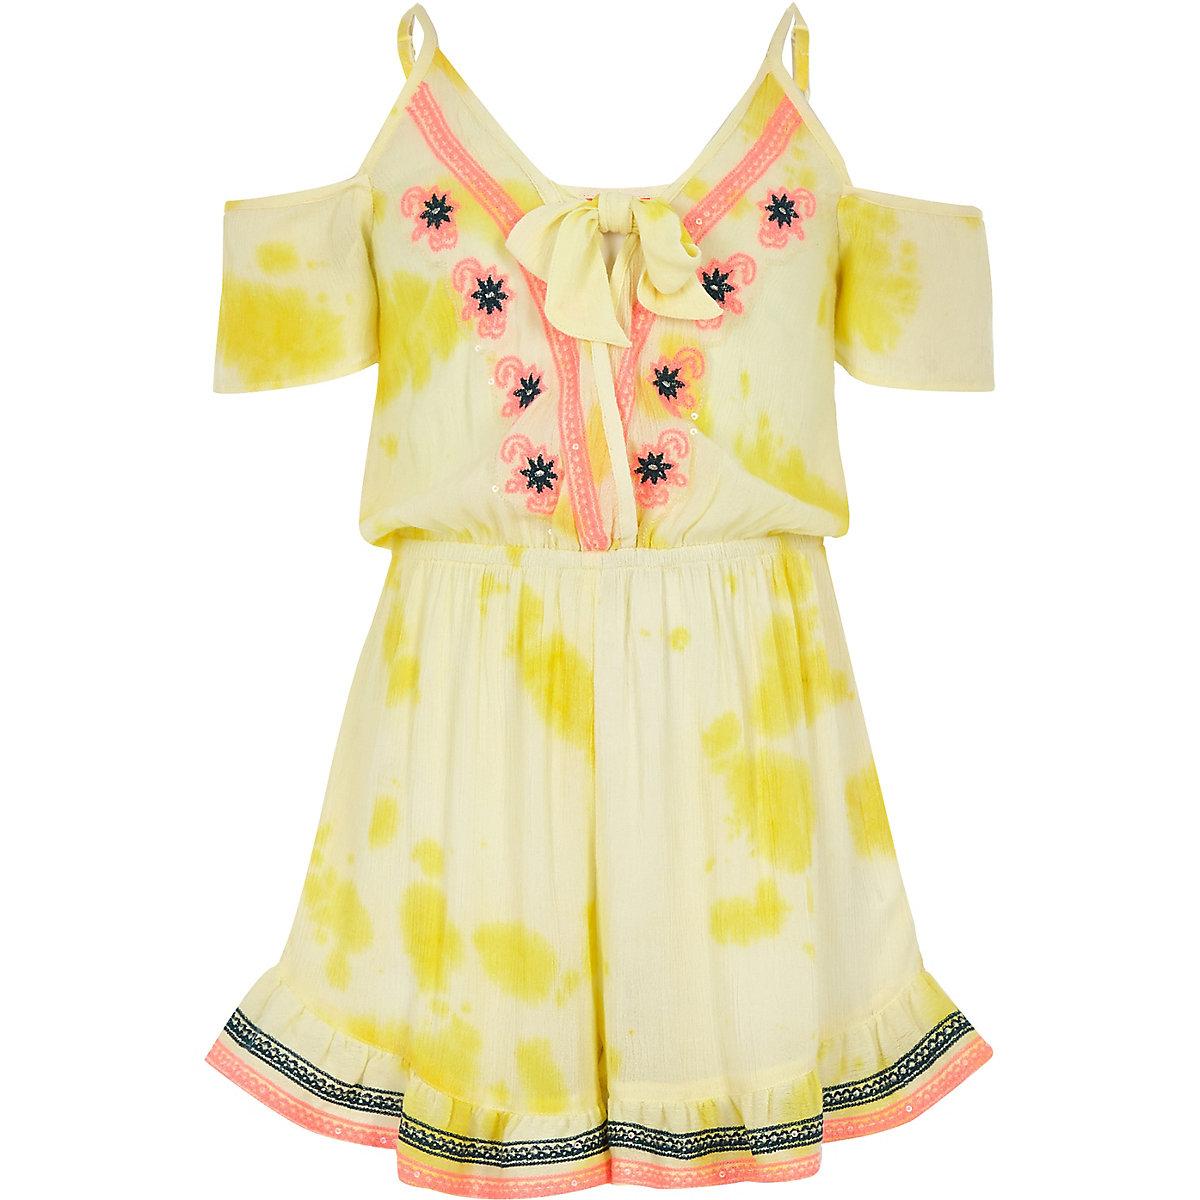 Girls yellow embroidered beach romper